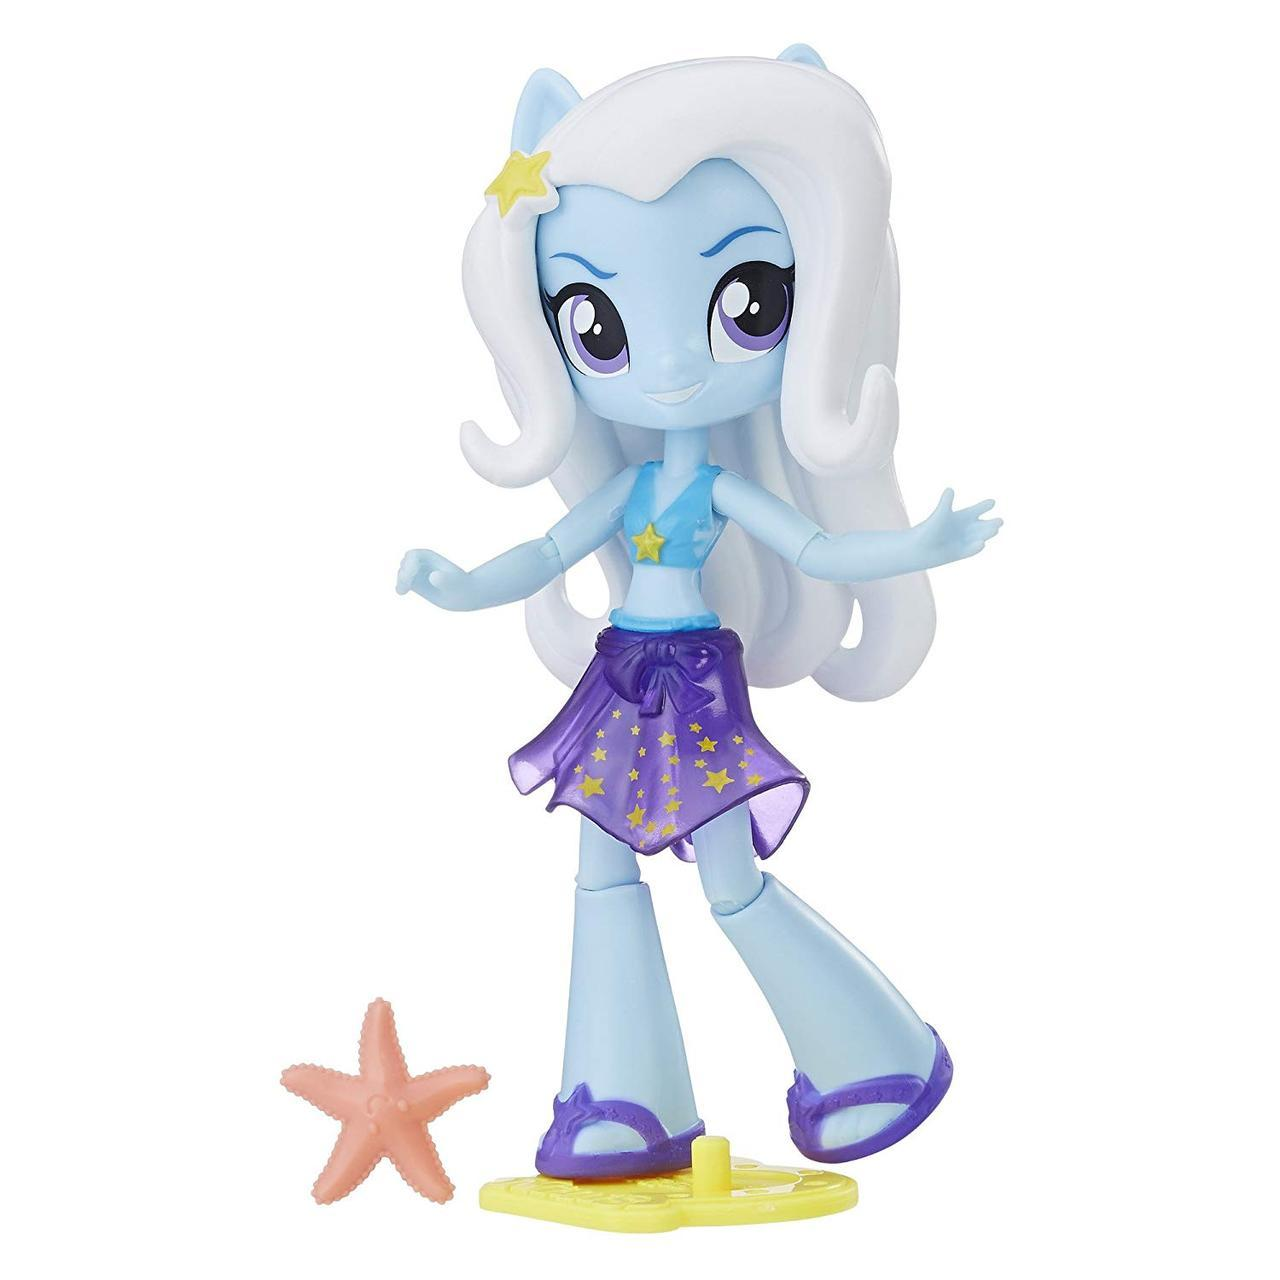 Май лител пони Трикси Луламун Пляж My Little Pony Equestria Girls Beach Collection Trixie Lulamoon оригинал